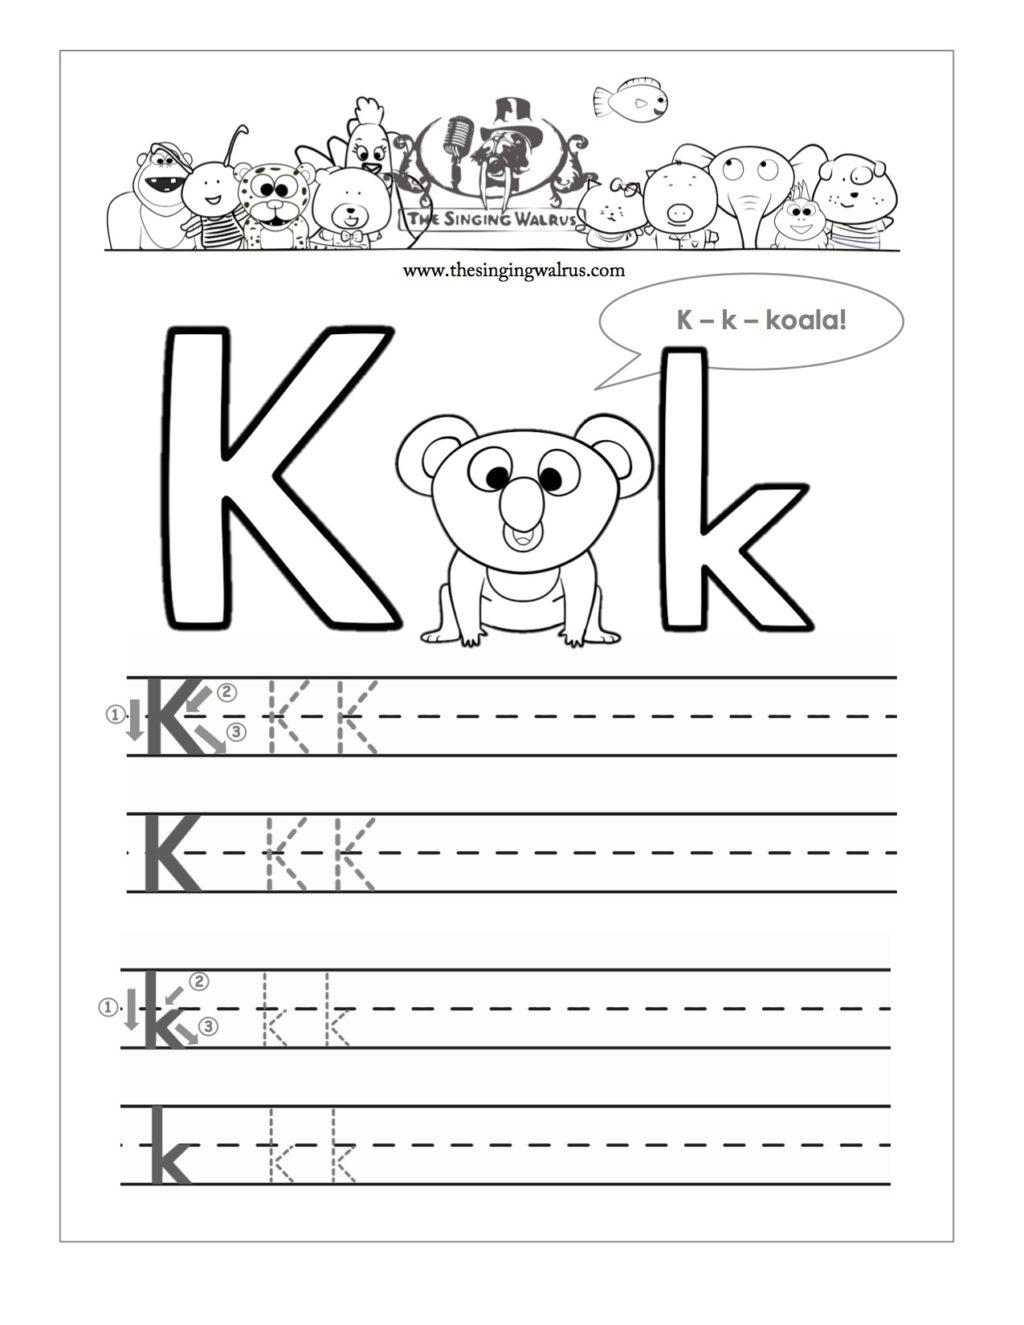 Worksheet ~ Worksheet Letter K Preschool Worksheets Free For